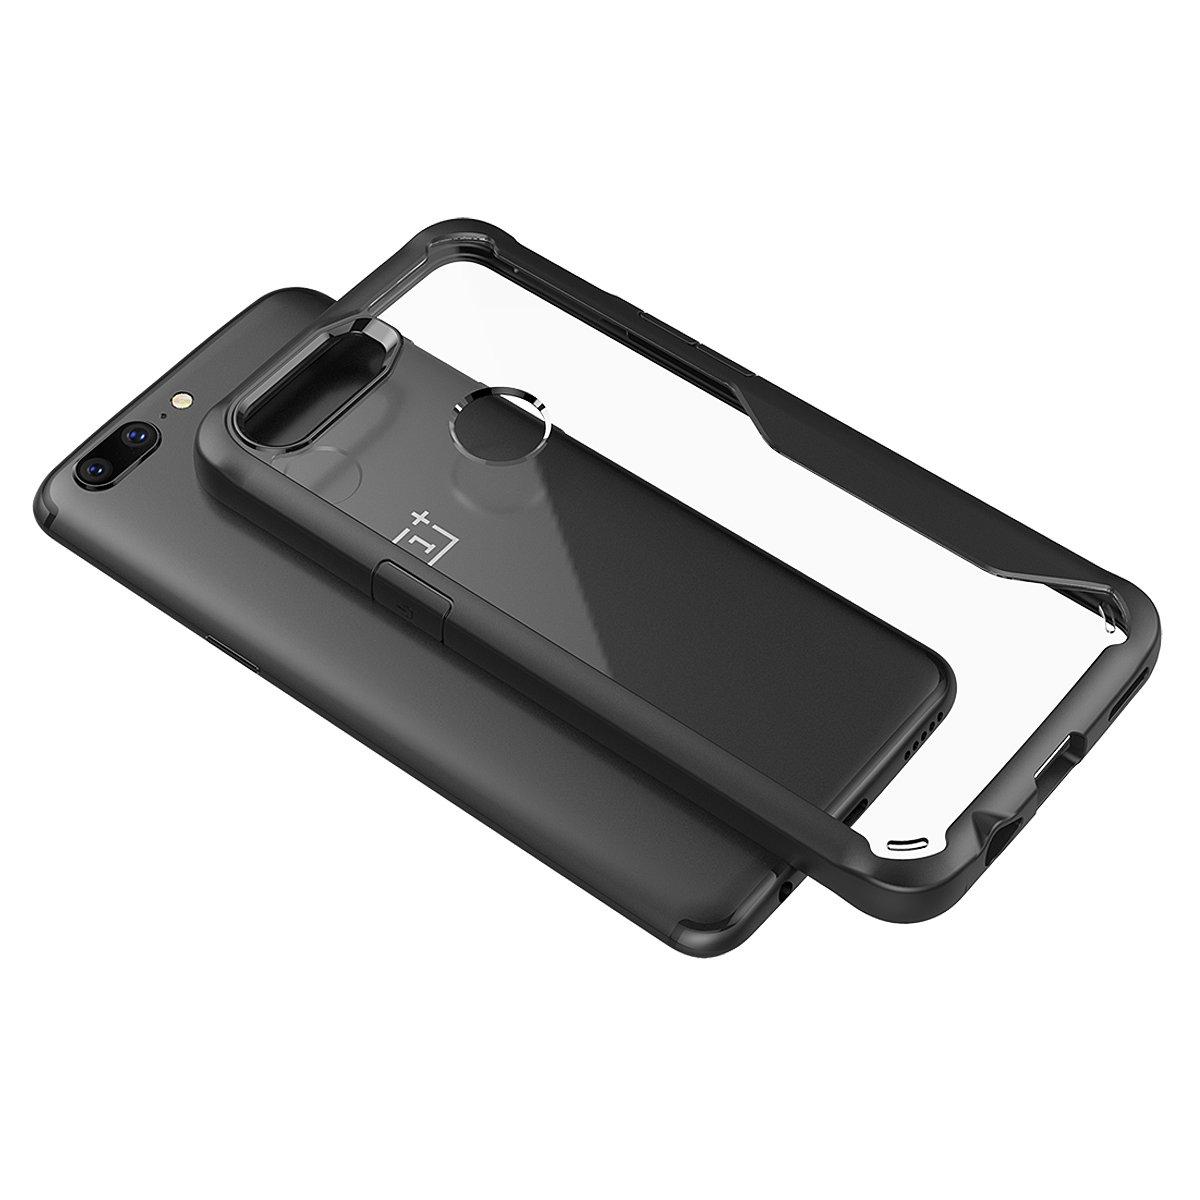 FugouSell OnePlus 5T Funda Silicone, One Plus 5T Carcasa ...